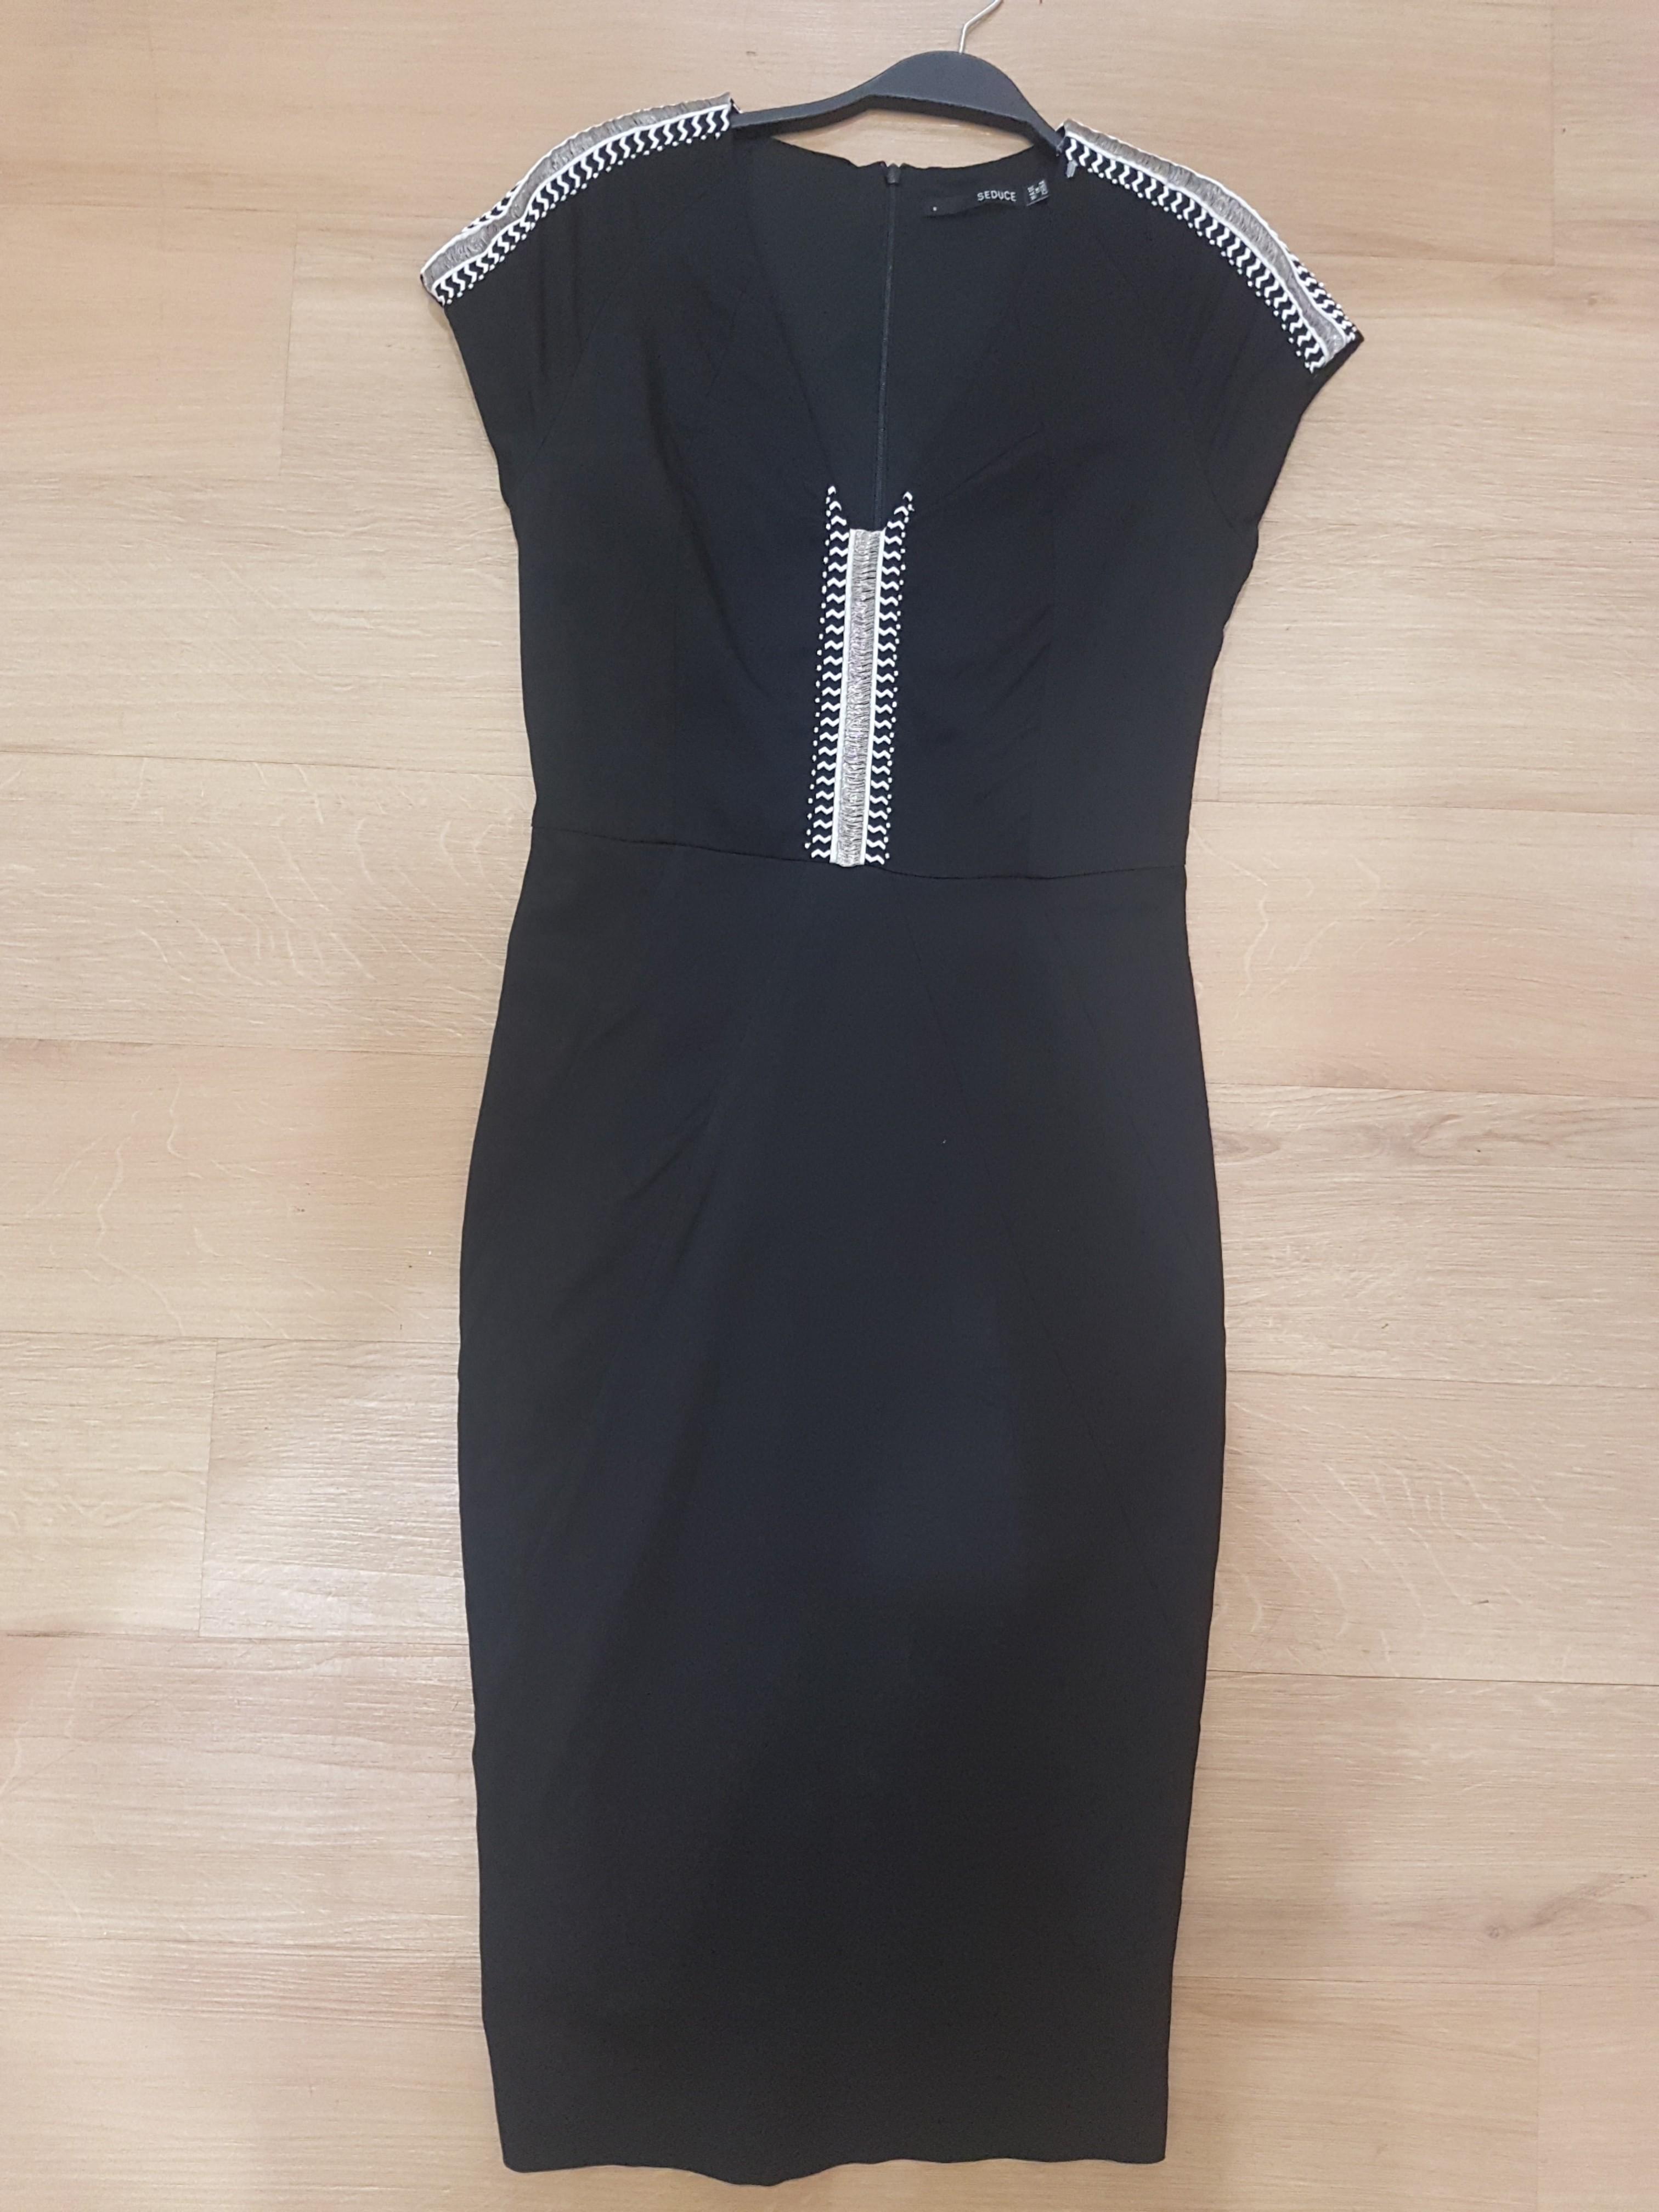 Seduce Dress Black Size 8 Bodycon Work Corporate Career